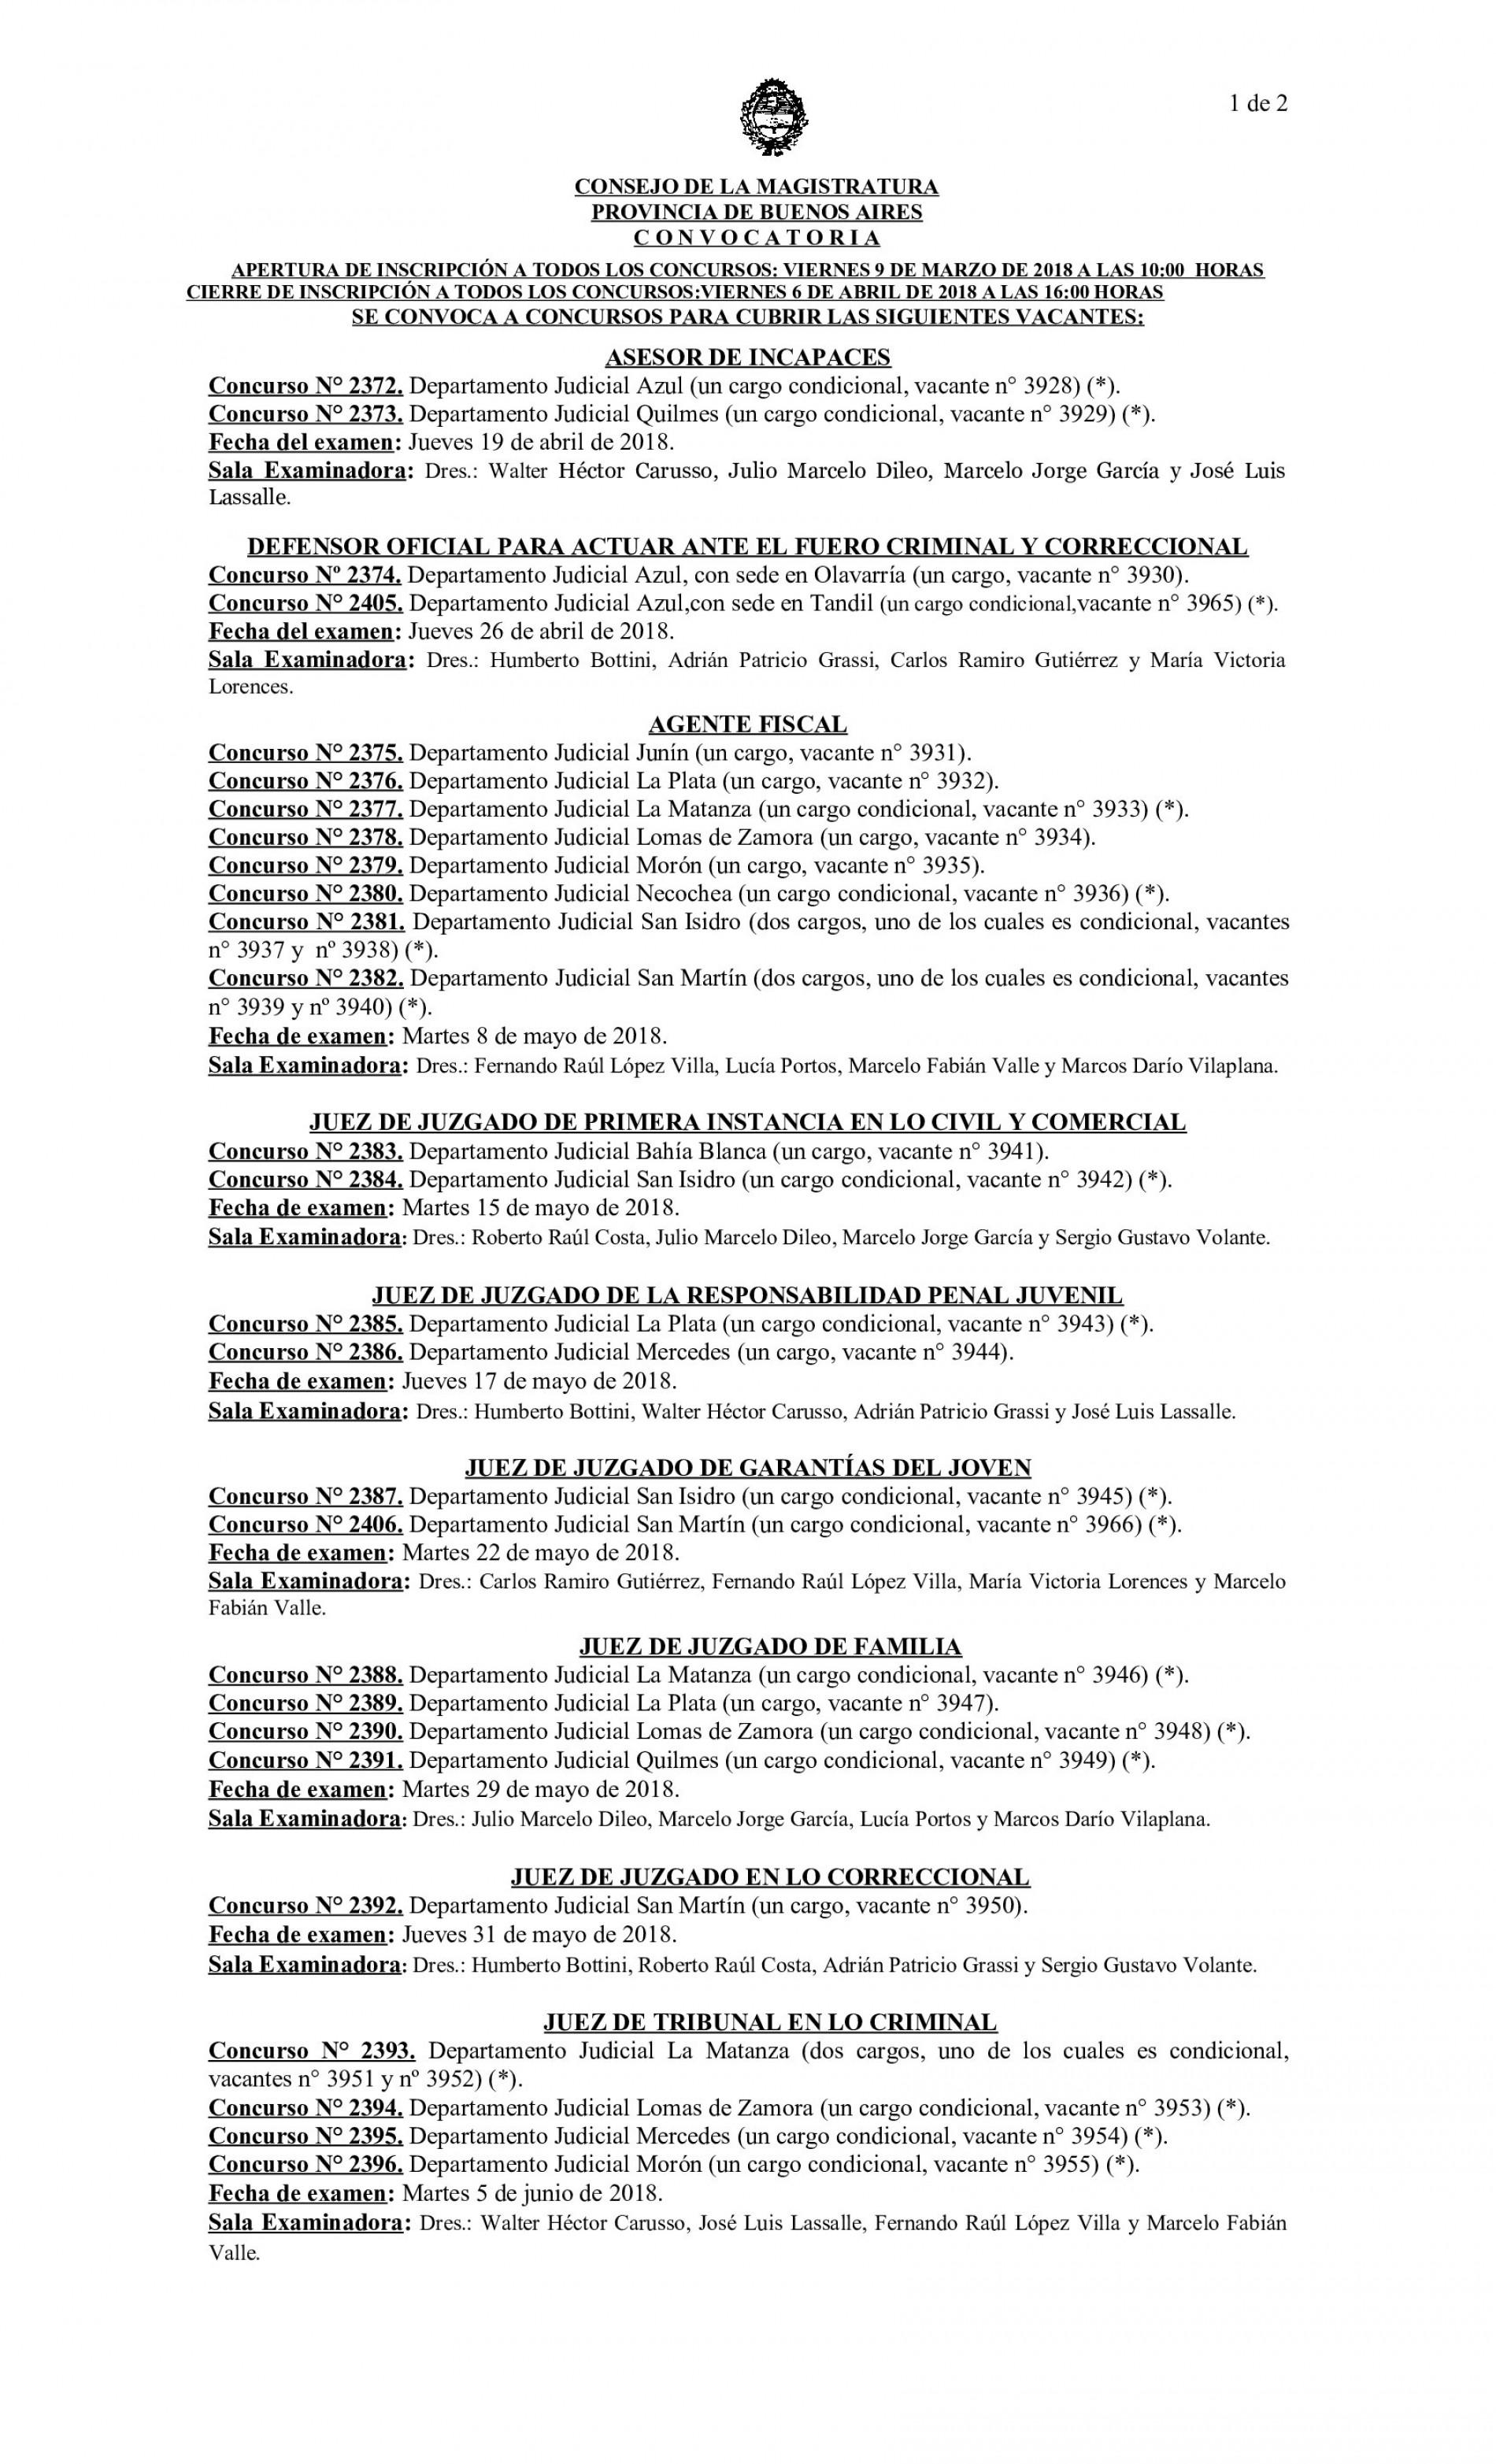 Consejo de la Magistratura de la Provincia de Buenos Aires-Convocatoria Nro. 2